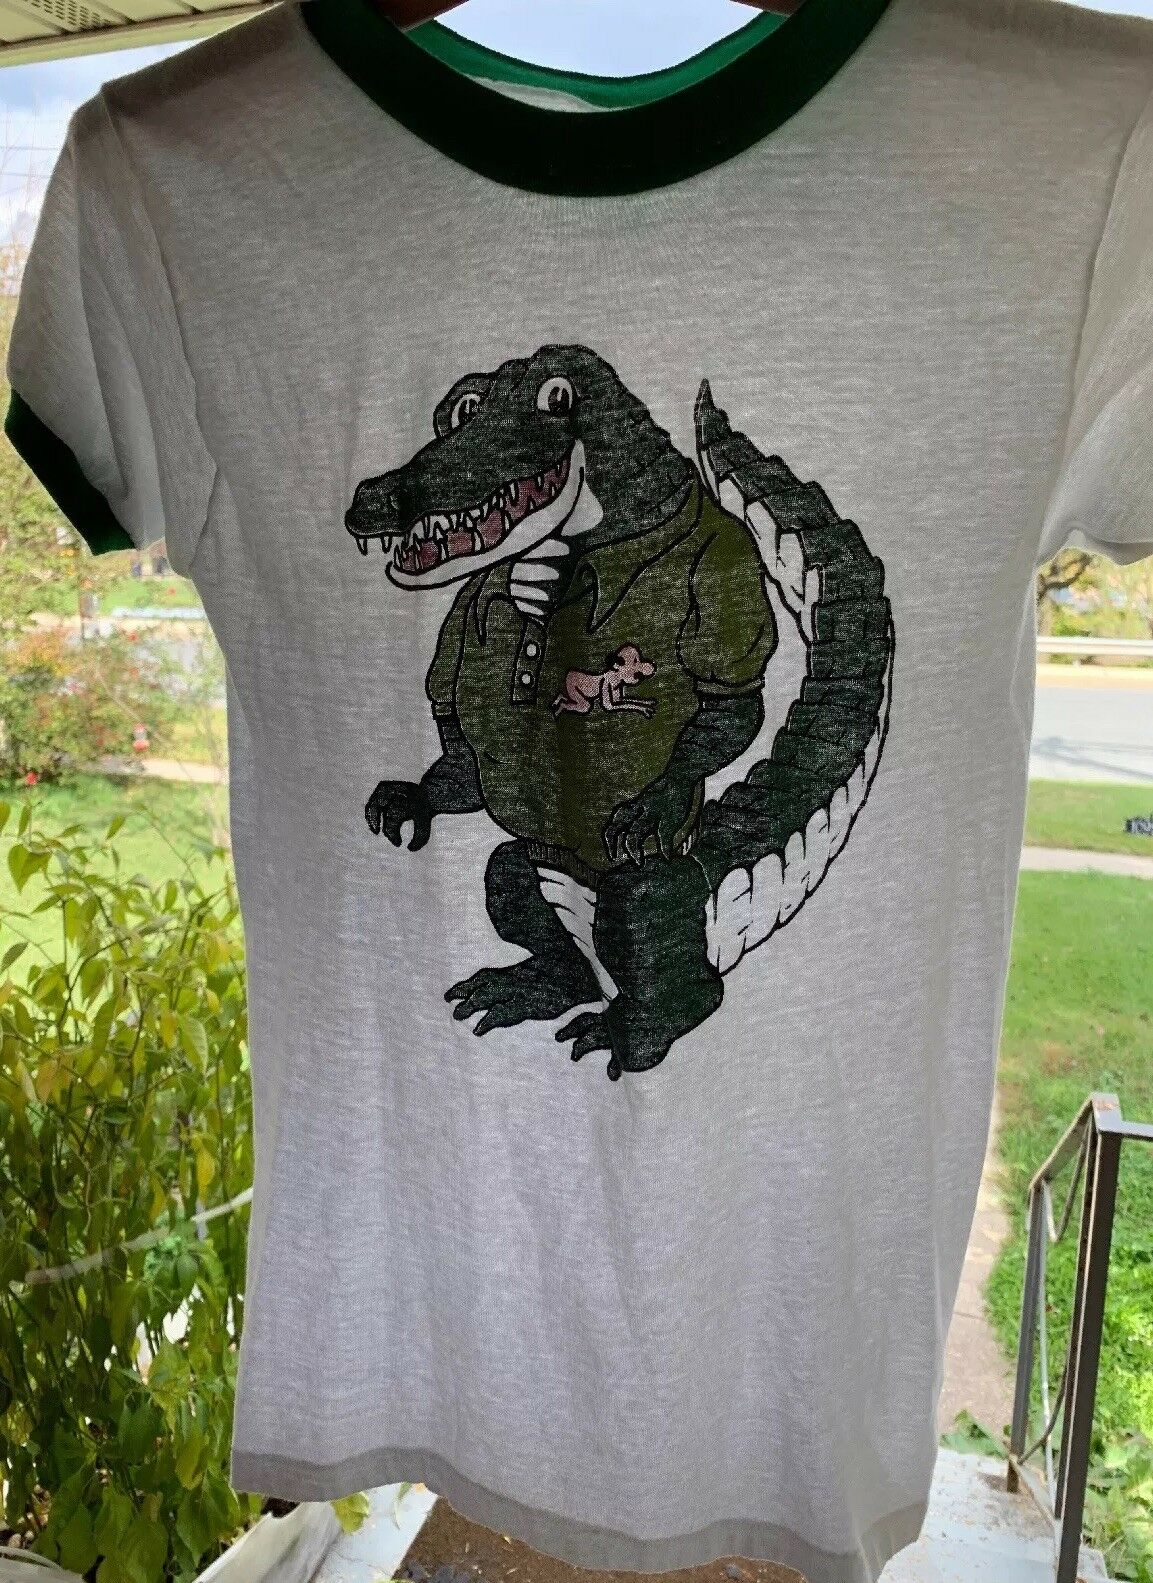 Vintage Crocodile Screening White Green Ringer 50 50% Cotton  Poly Thin T Shirt.